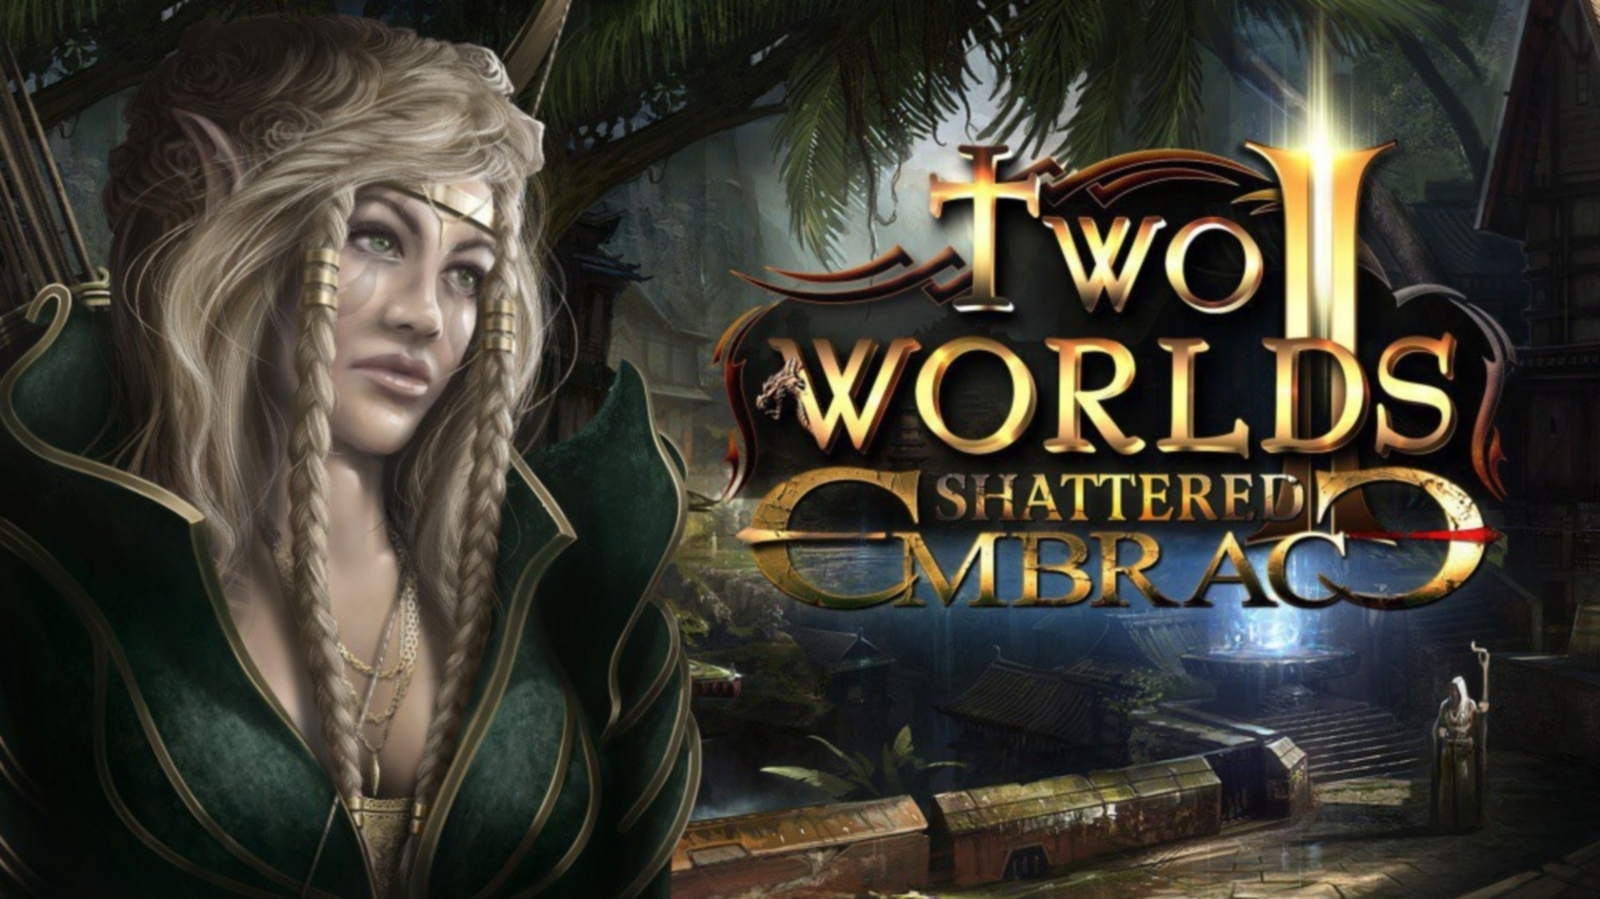 Дополнение Shattered Embrace к Two Worlds II выйдет 6 декабря